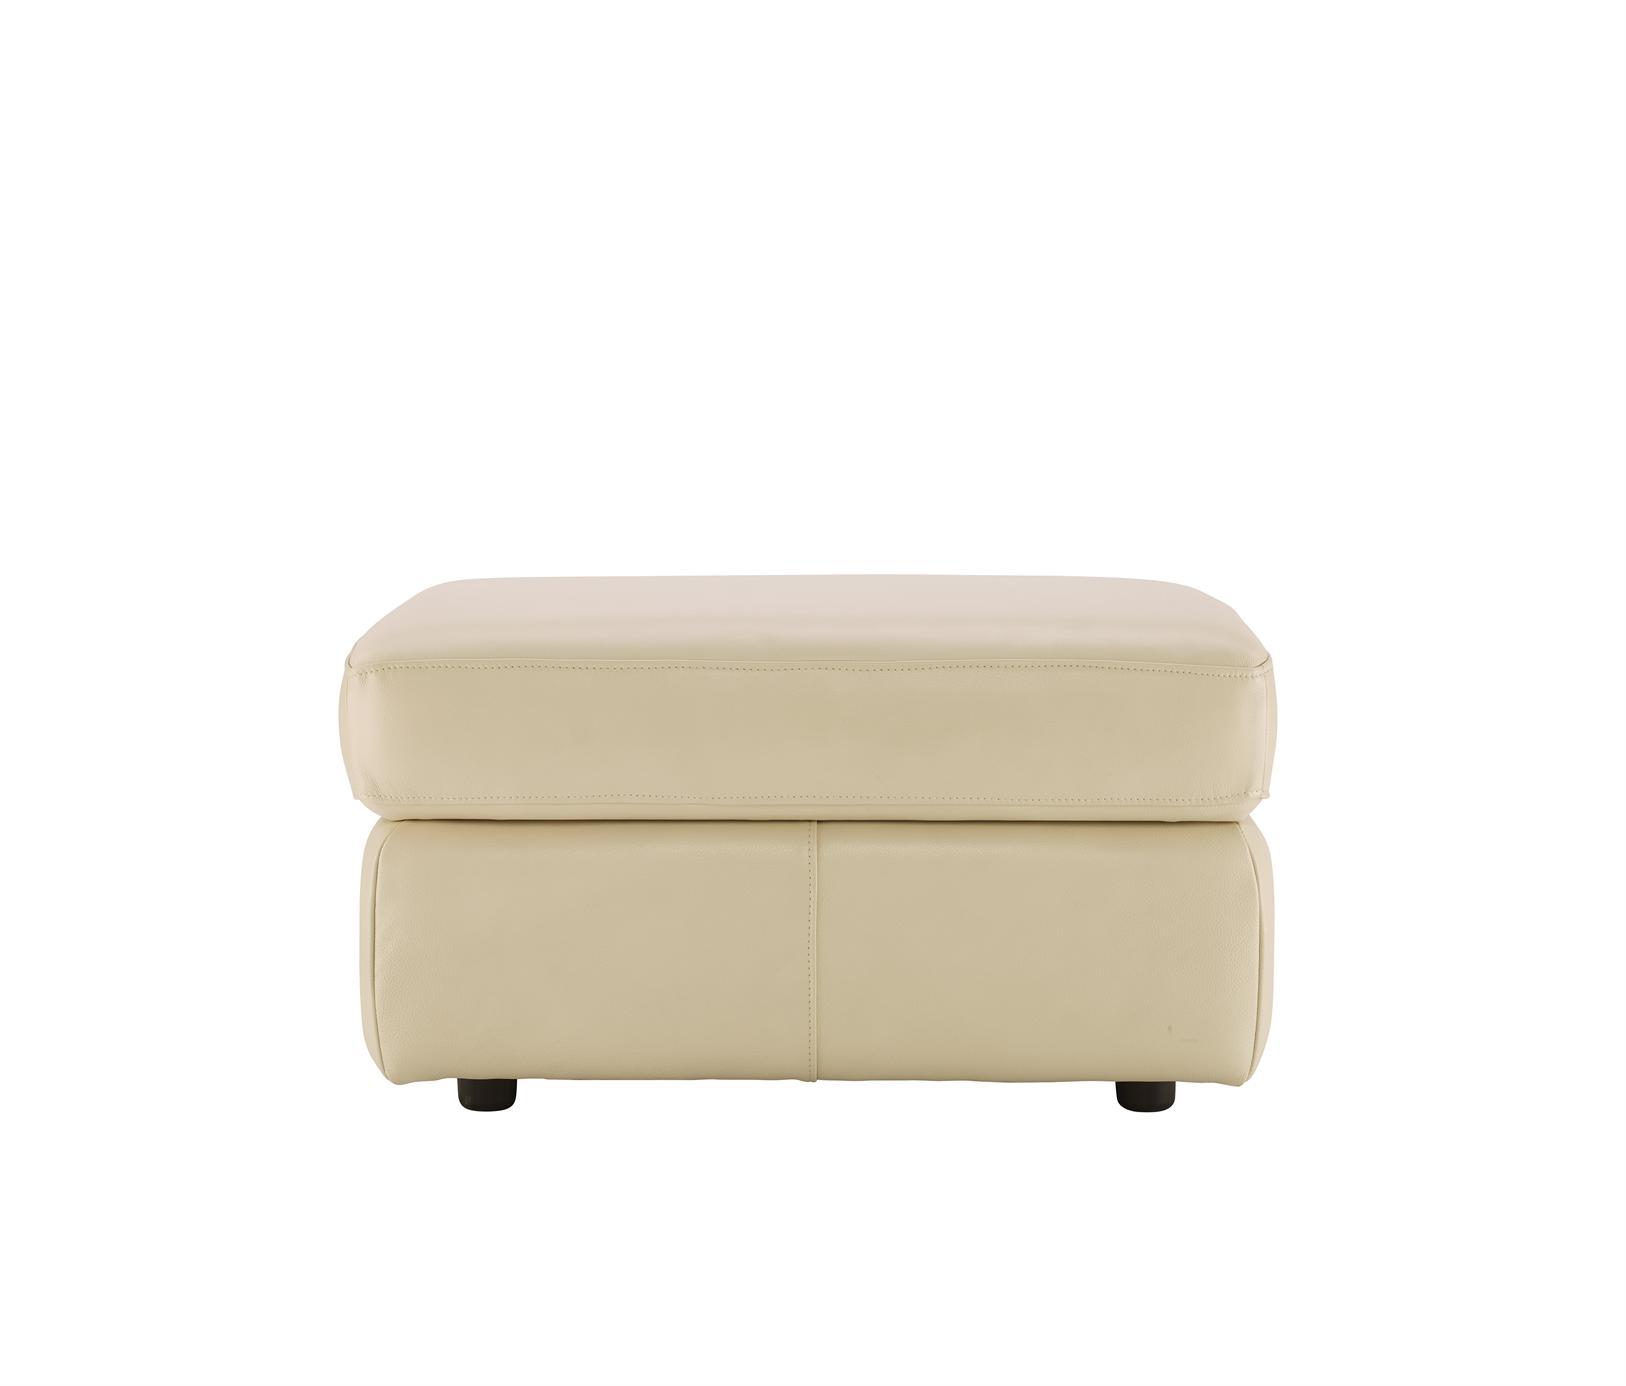 GPlan - Atlanta Leather Storage Footstool